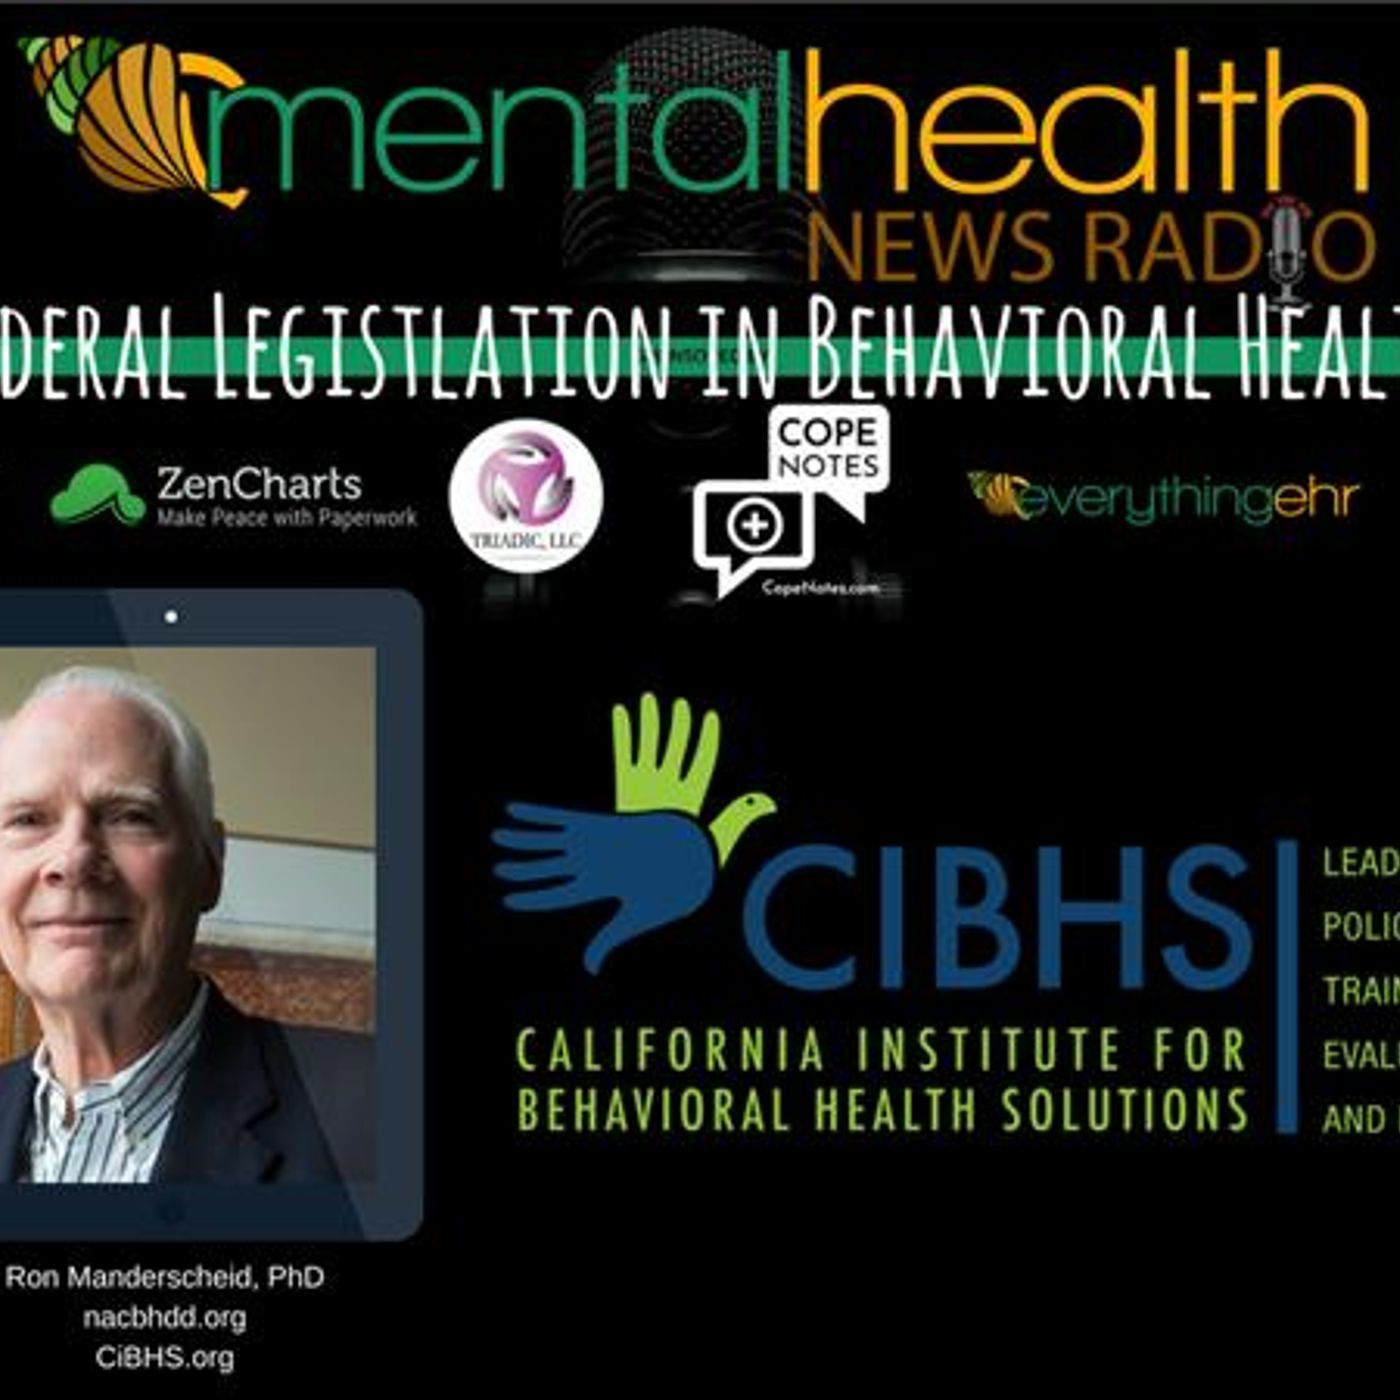 Mental Health News Radio - Federal Legislation in Behavioral Health with Ron Manderscheid, PhD